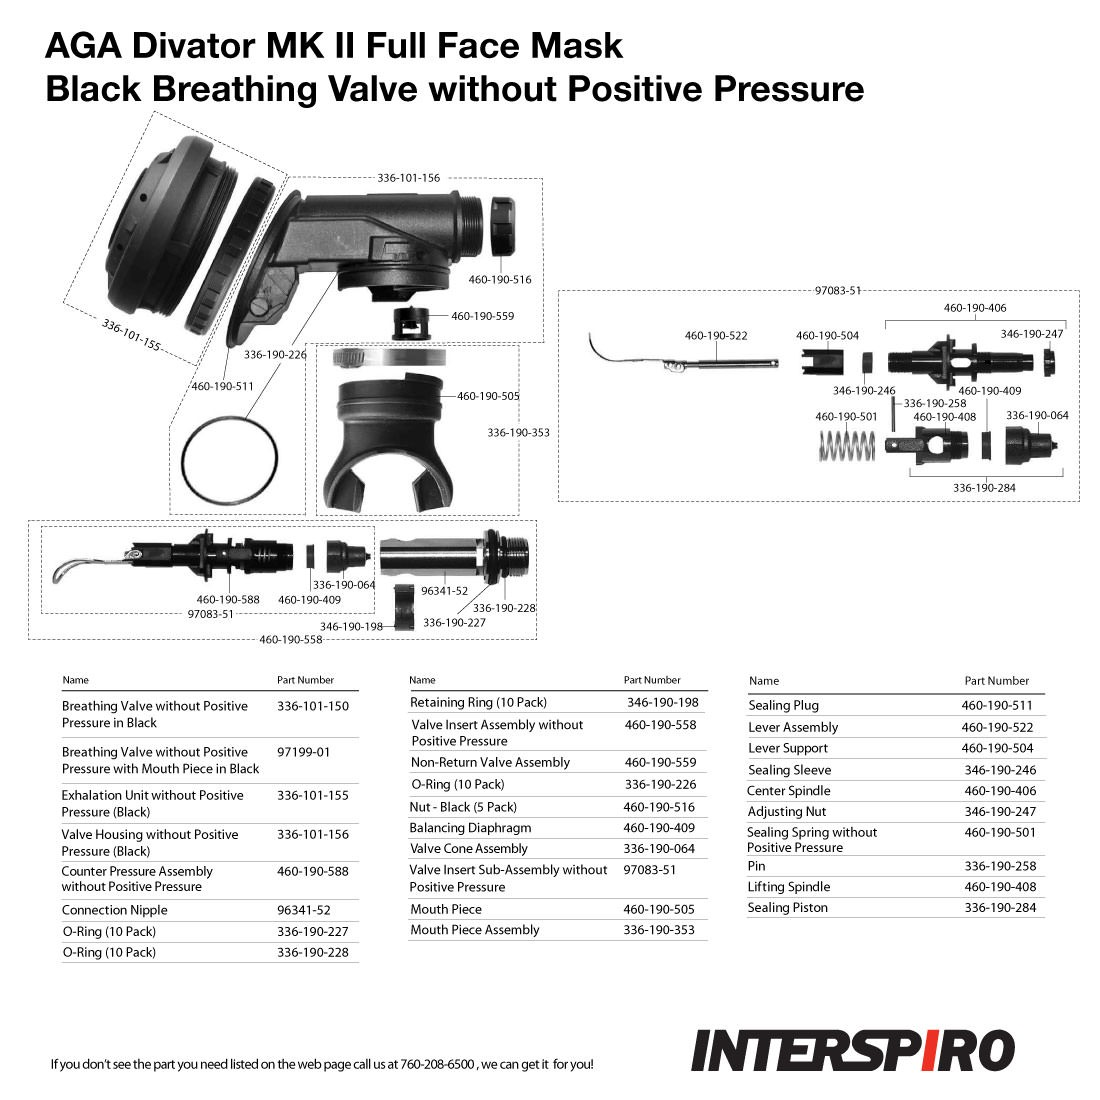 Interspiro AGA Divator MK II Full Face Mask with Demand Regulator - Silicone - Black - Breathing Valve